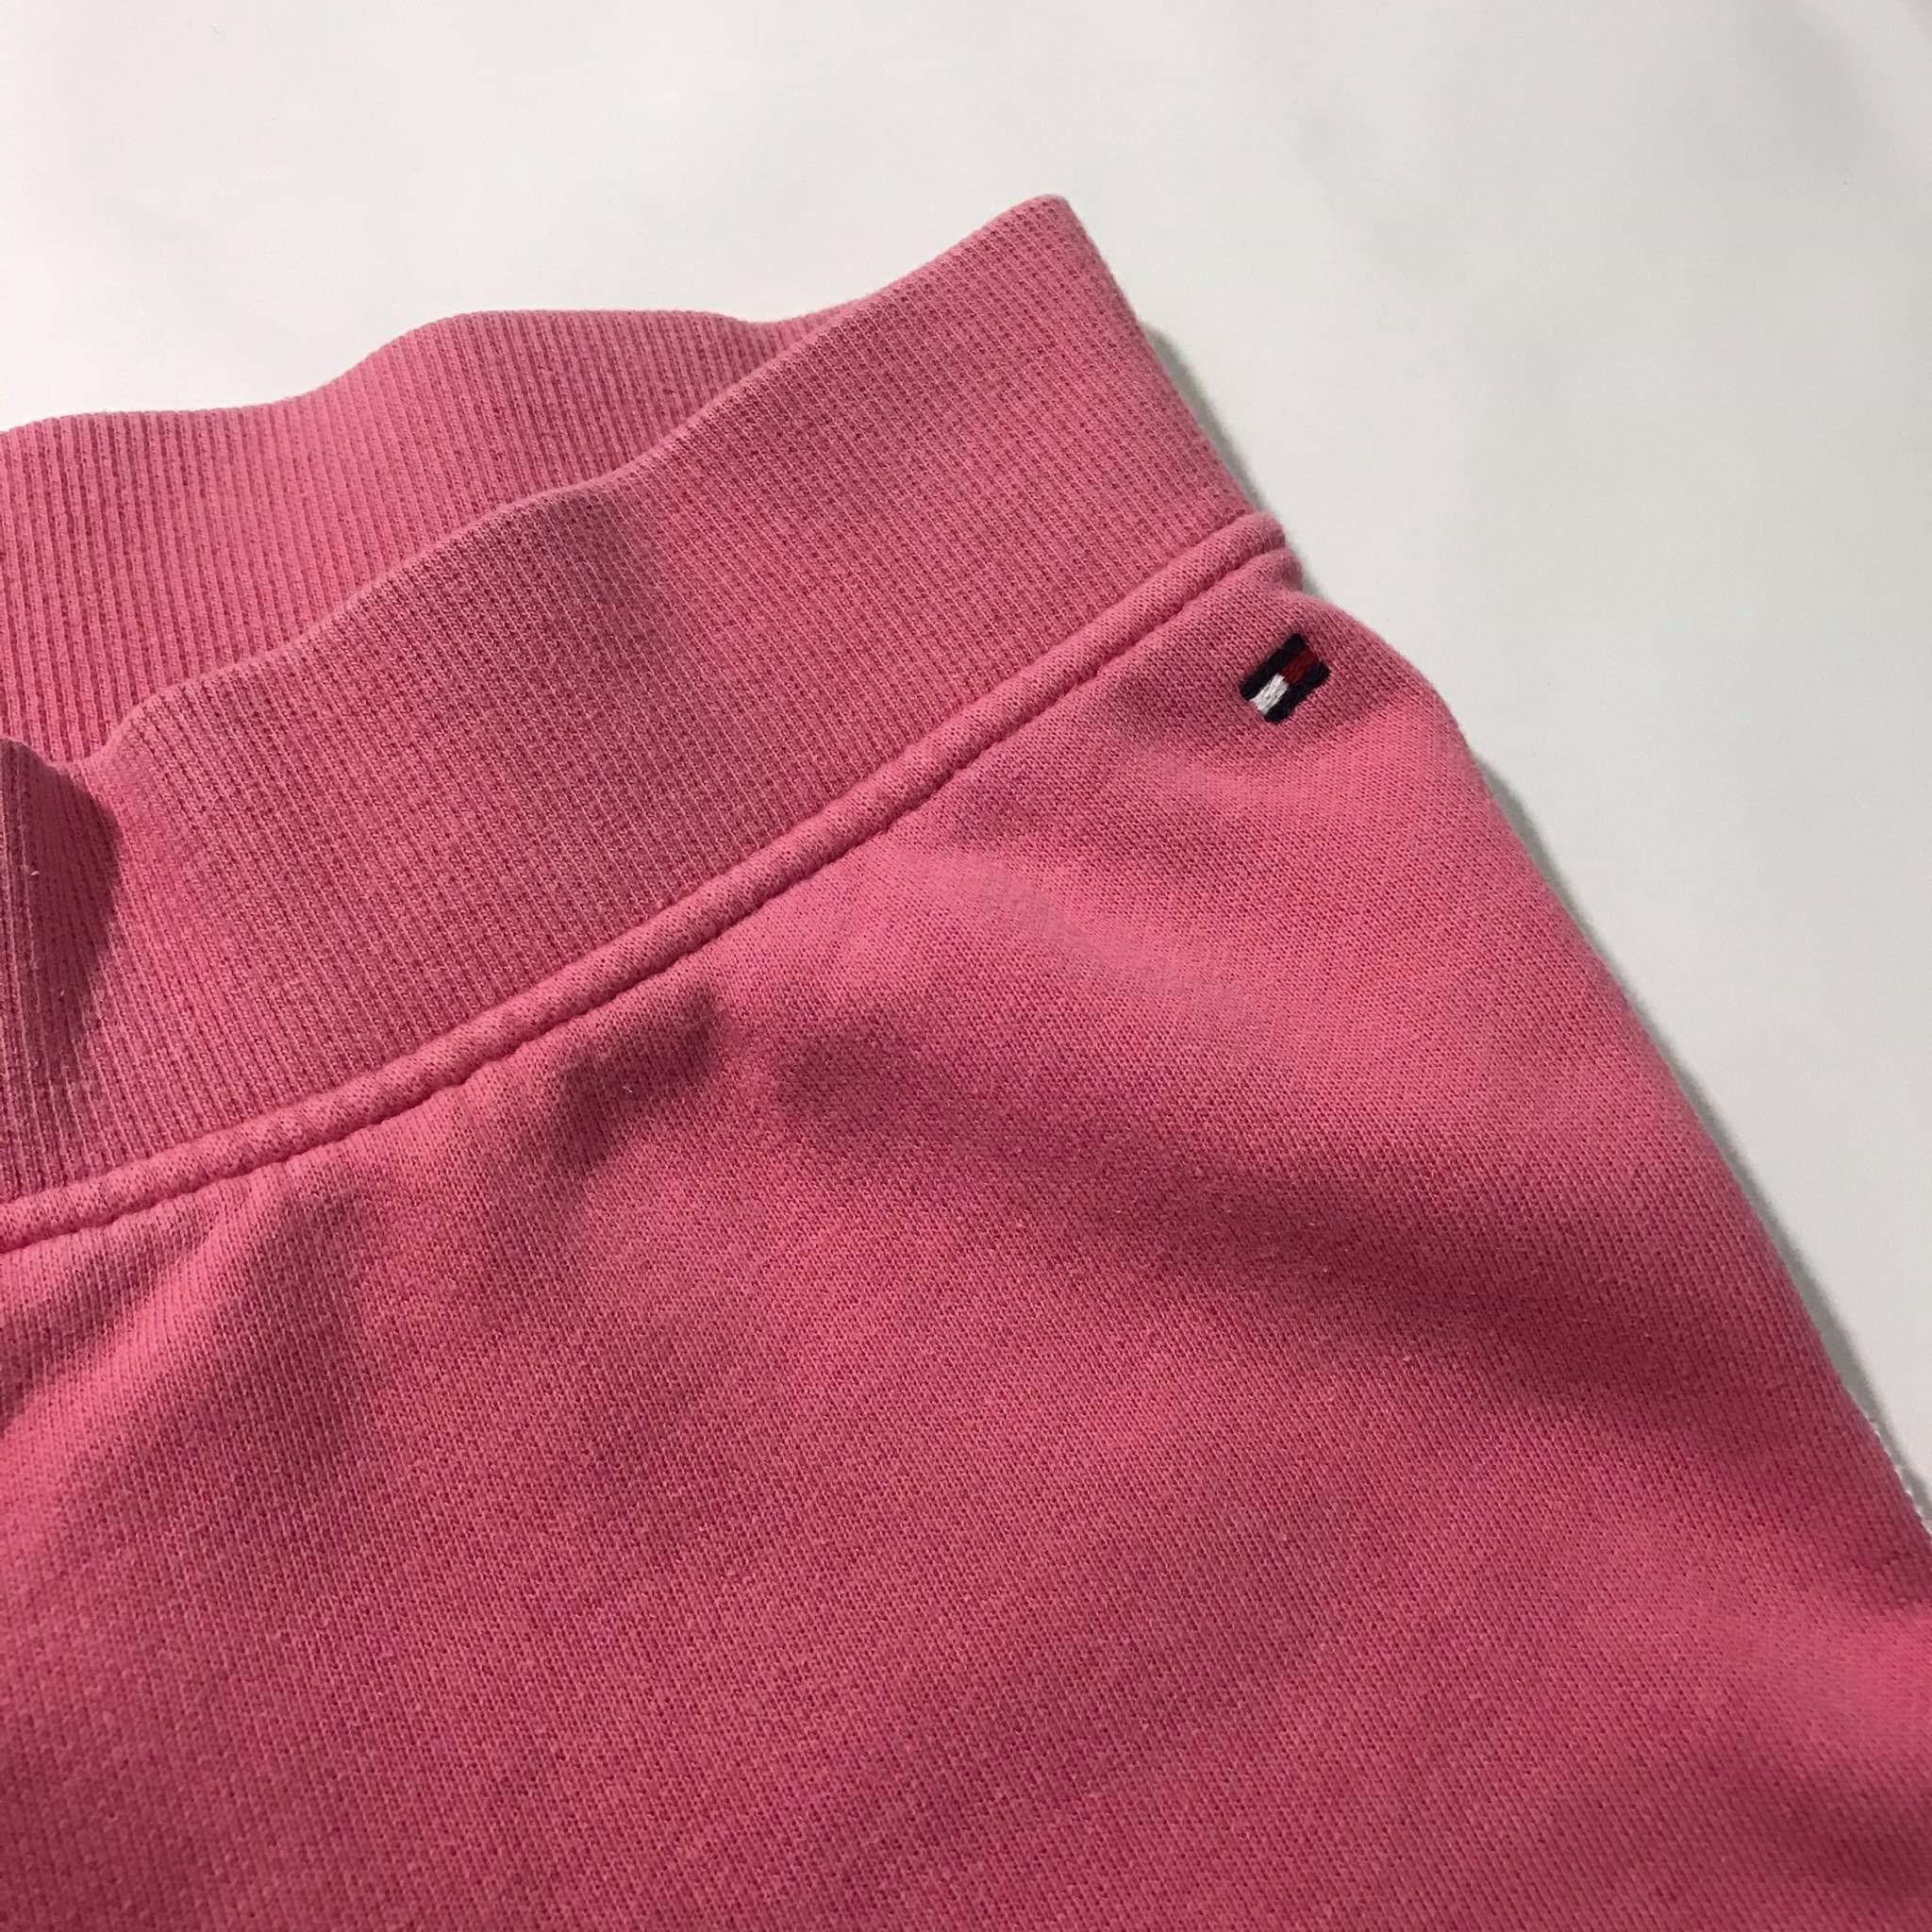 Pink Tommy Hilfiger sweatpants